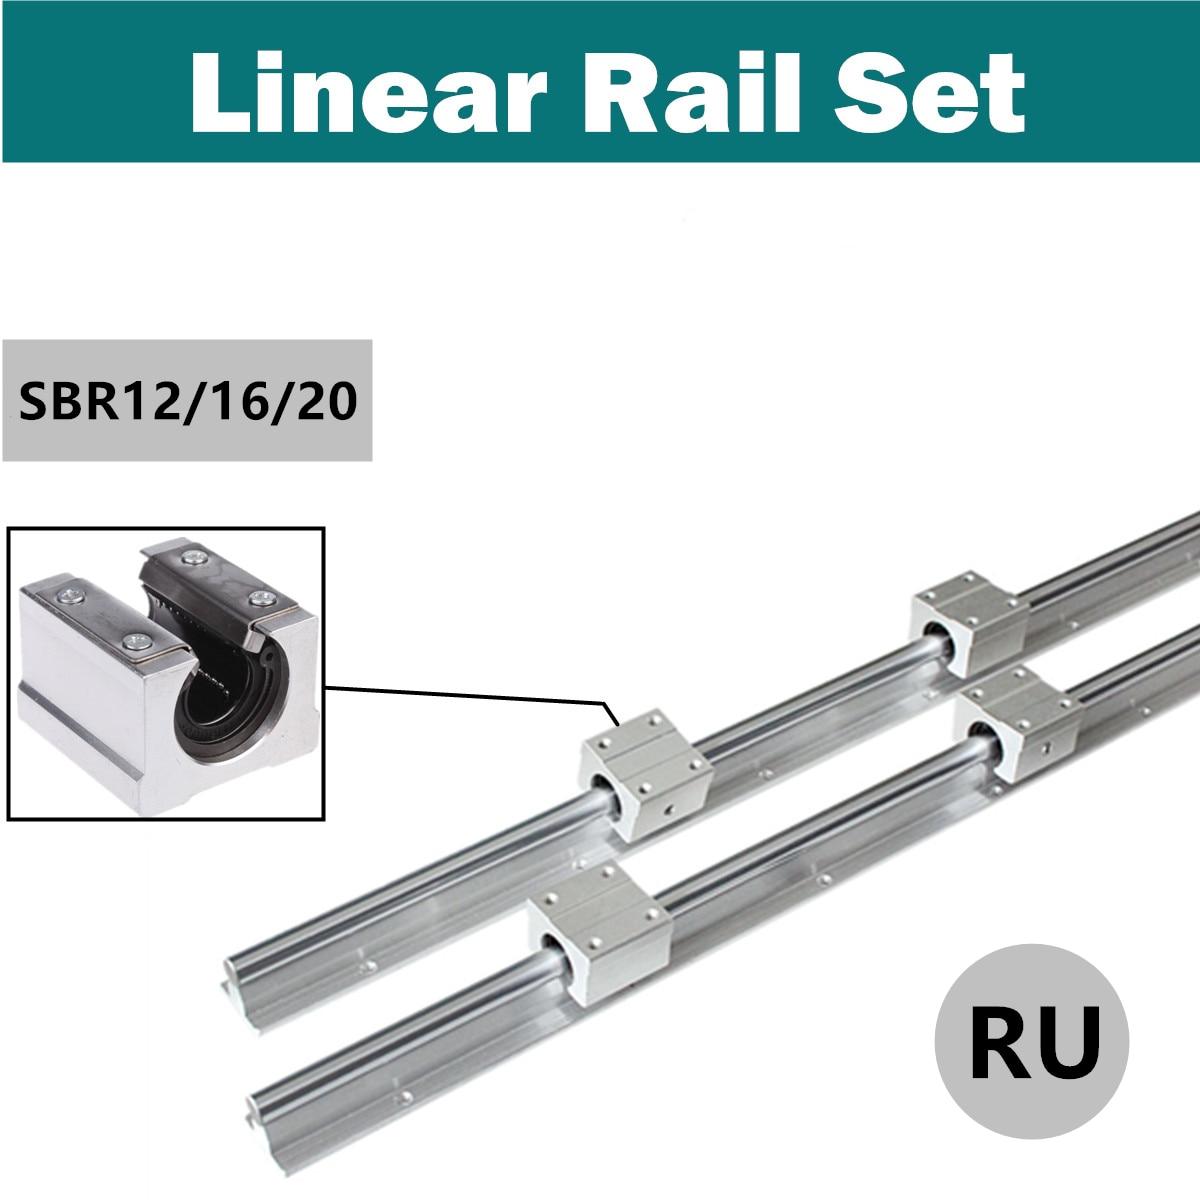 Ru Verzending 2Pcs SBR12/16/20 300-1500 Mm 12/16/20 Mm Lineaire lager Rail Slide Gids As + 4 Stuks SBR12UU Blokken Voor Cnc Machine